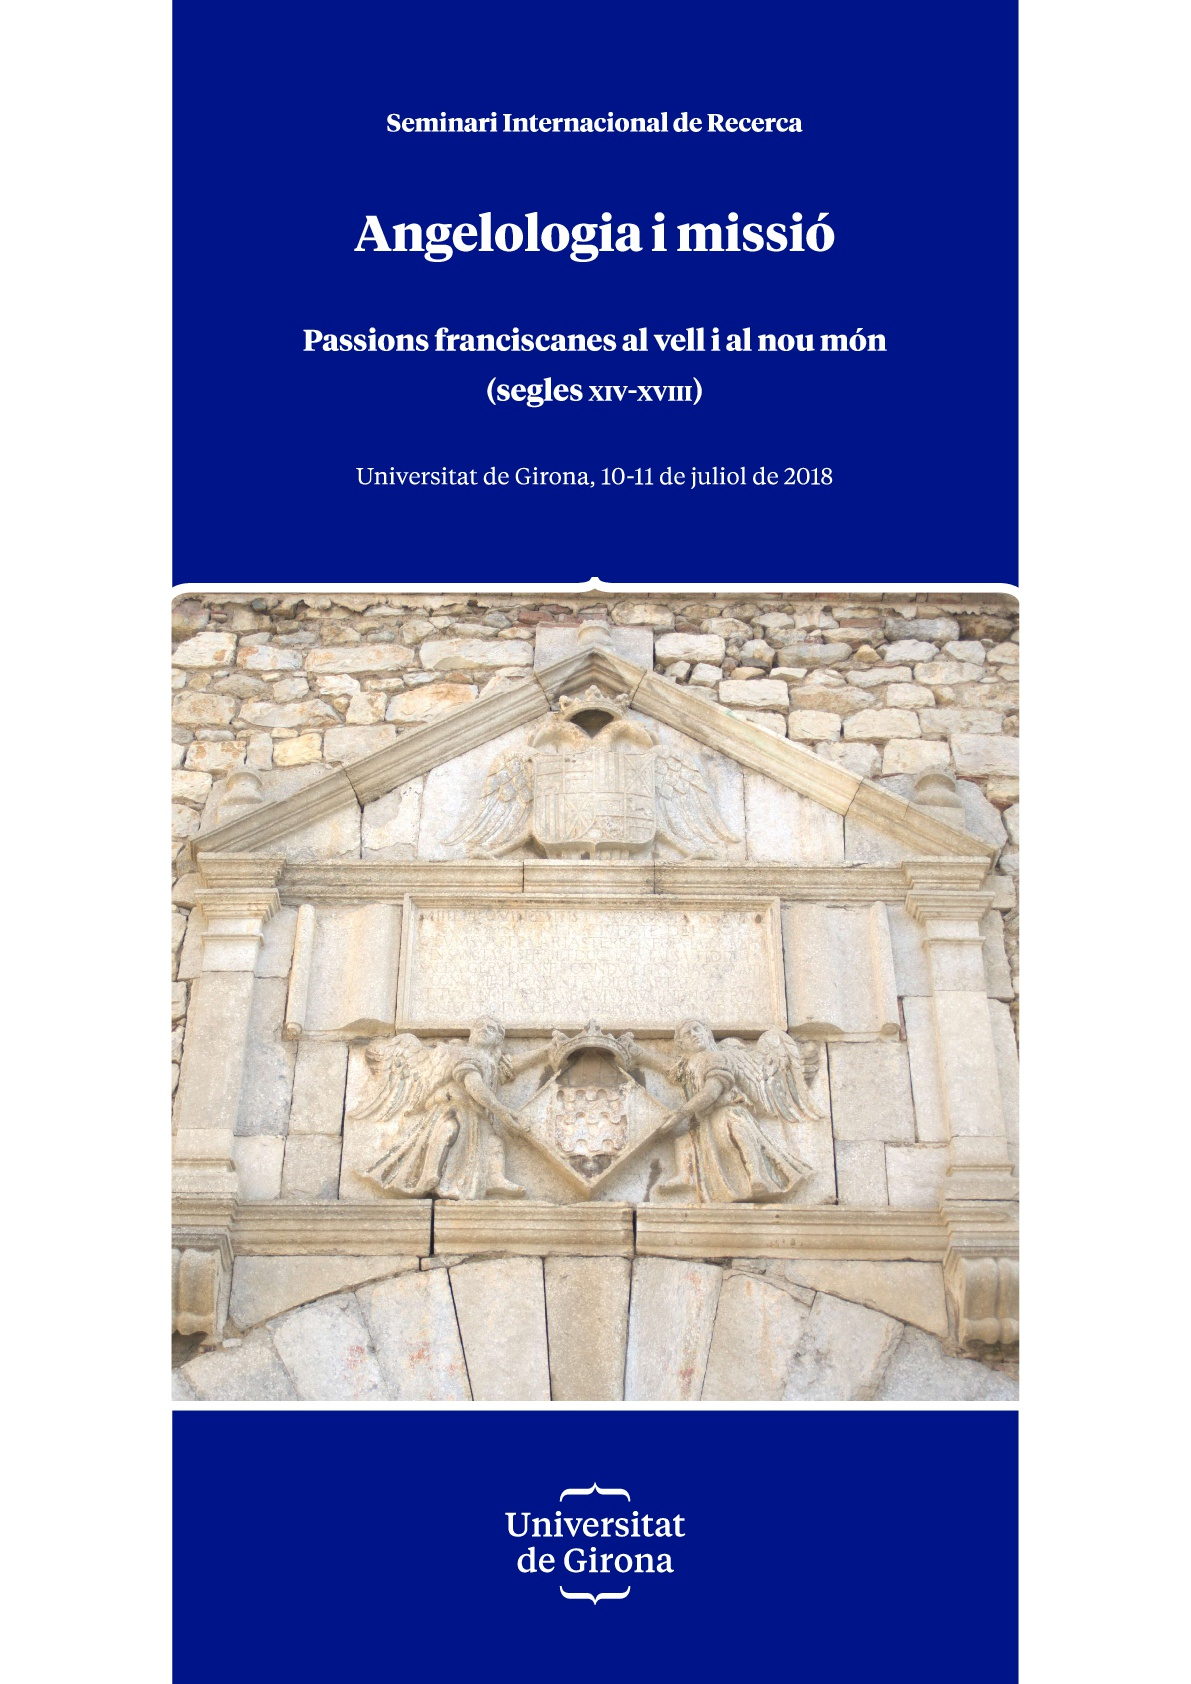 seminari-internacional-de-recerca-angelologia-i-missio